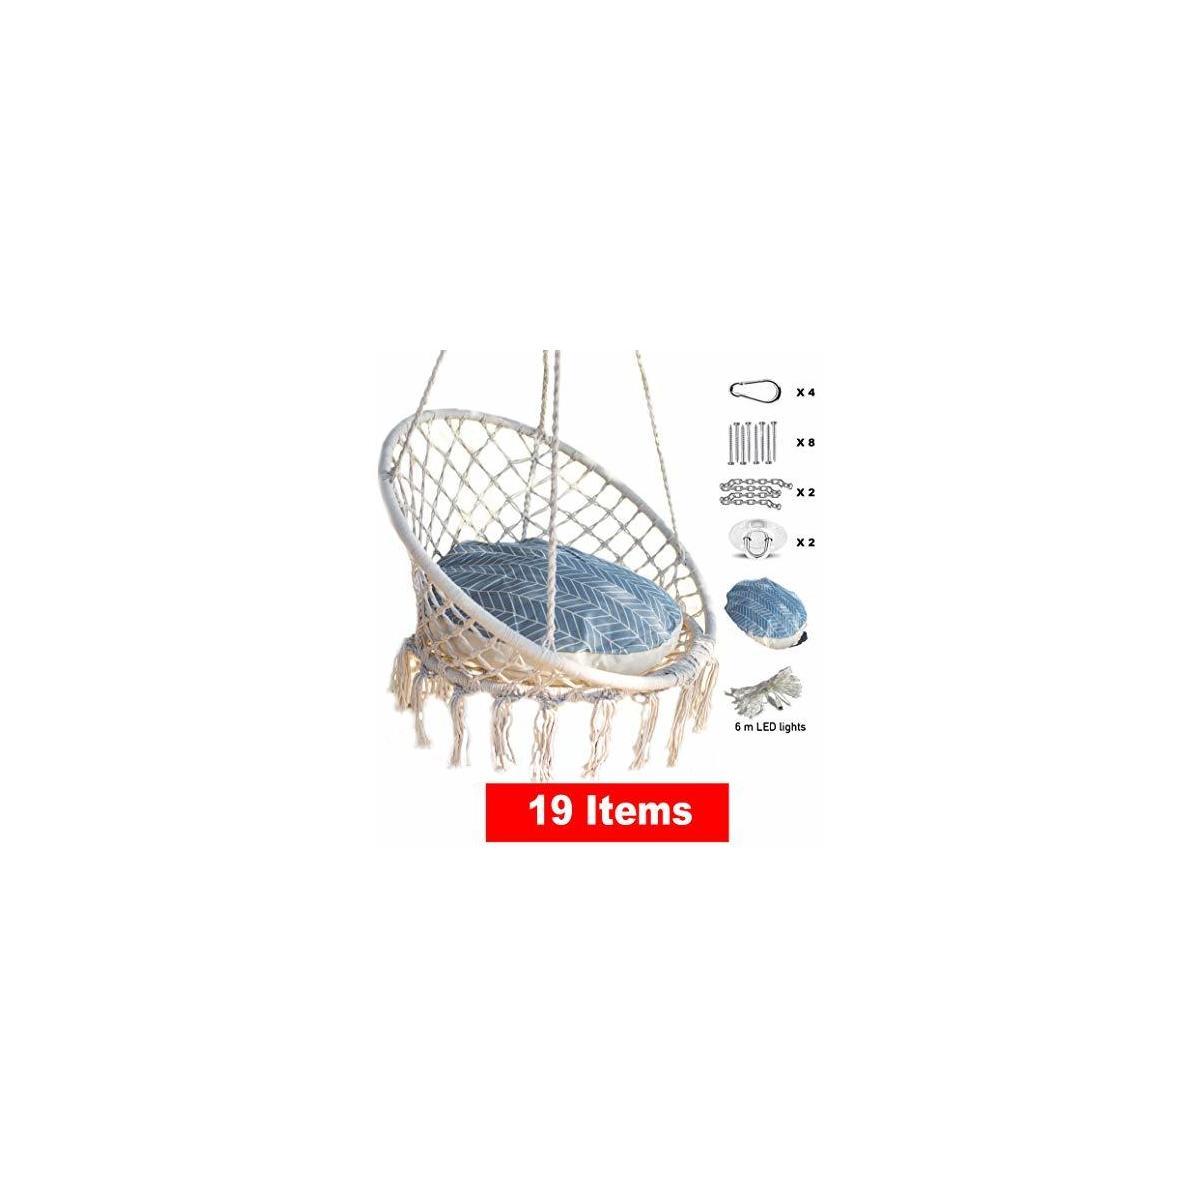 Macrame Hanging Chair with Large Cushion, Lights & DIY Hanging Kit